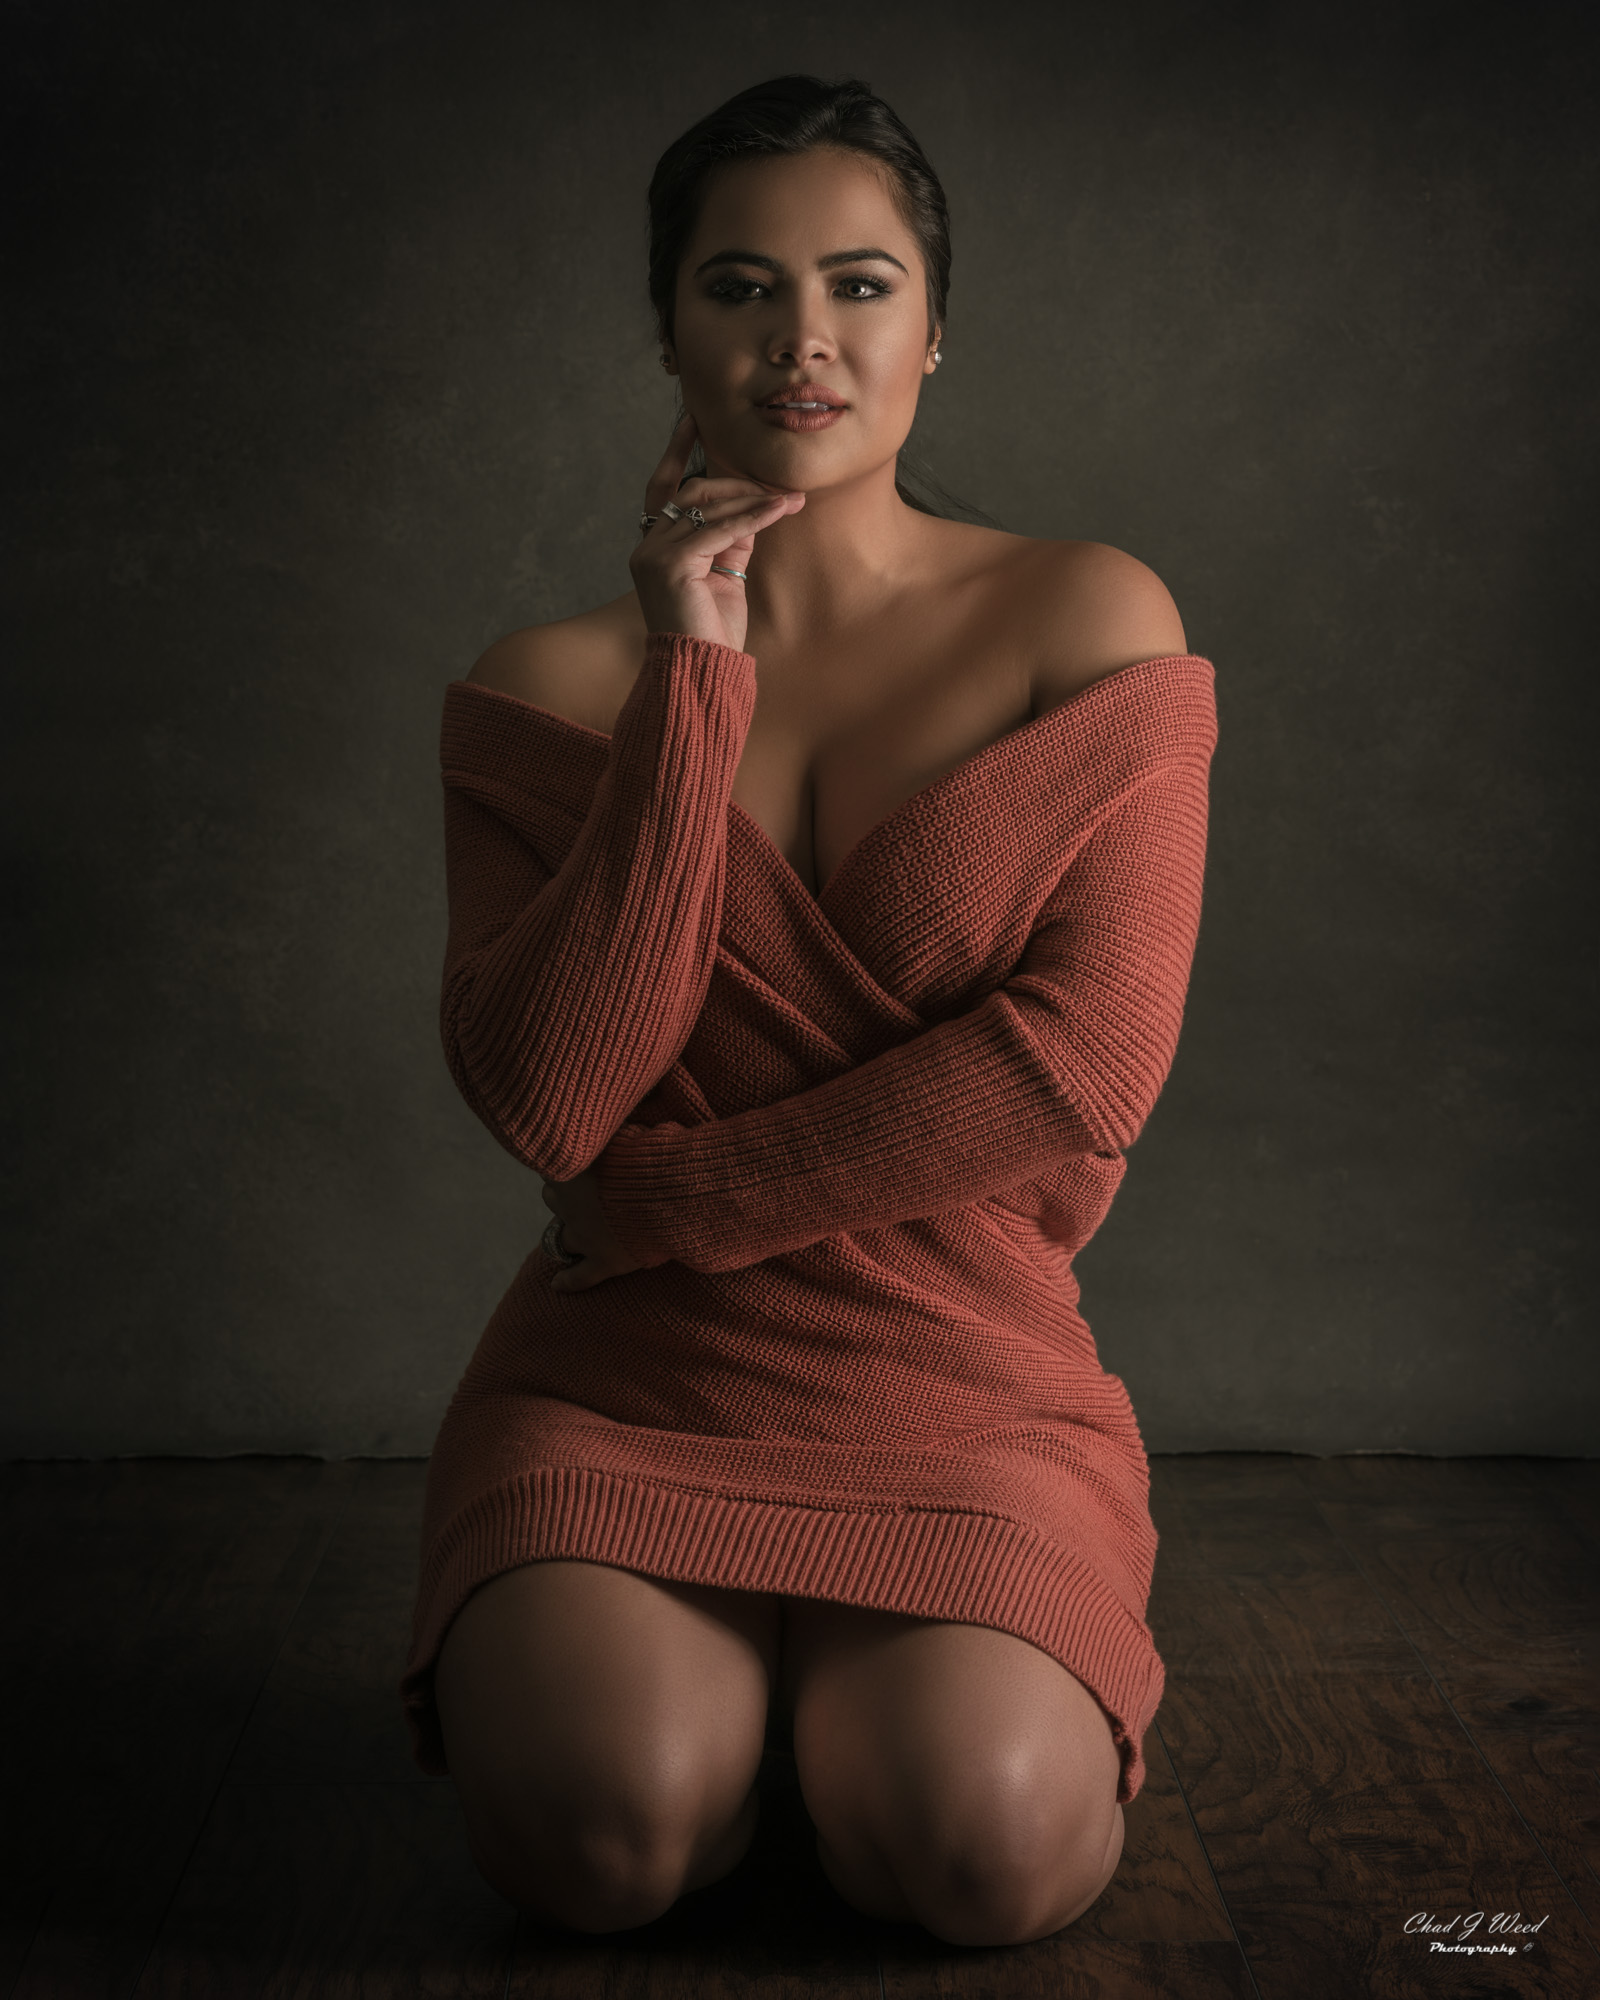 Mesa Arizona Portrait Photographer Chad Weed of Beauty Model Karla